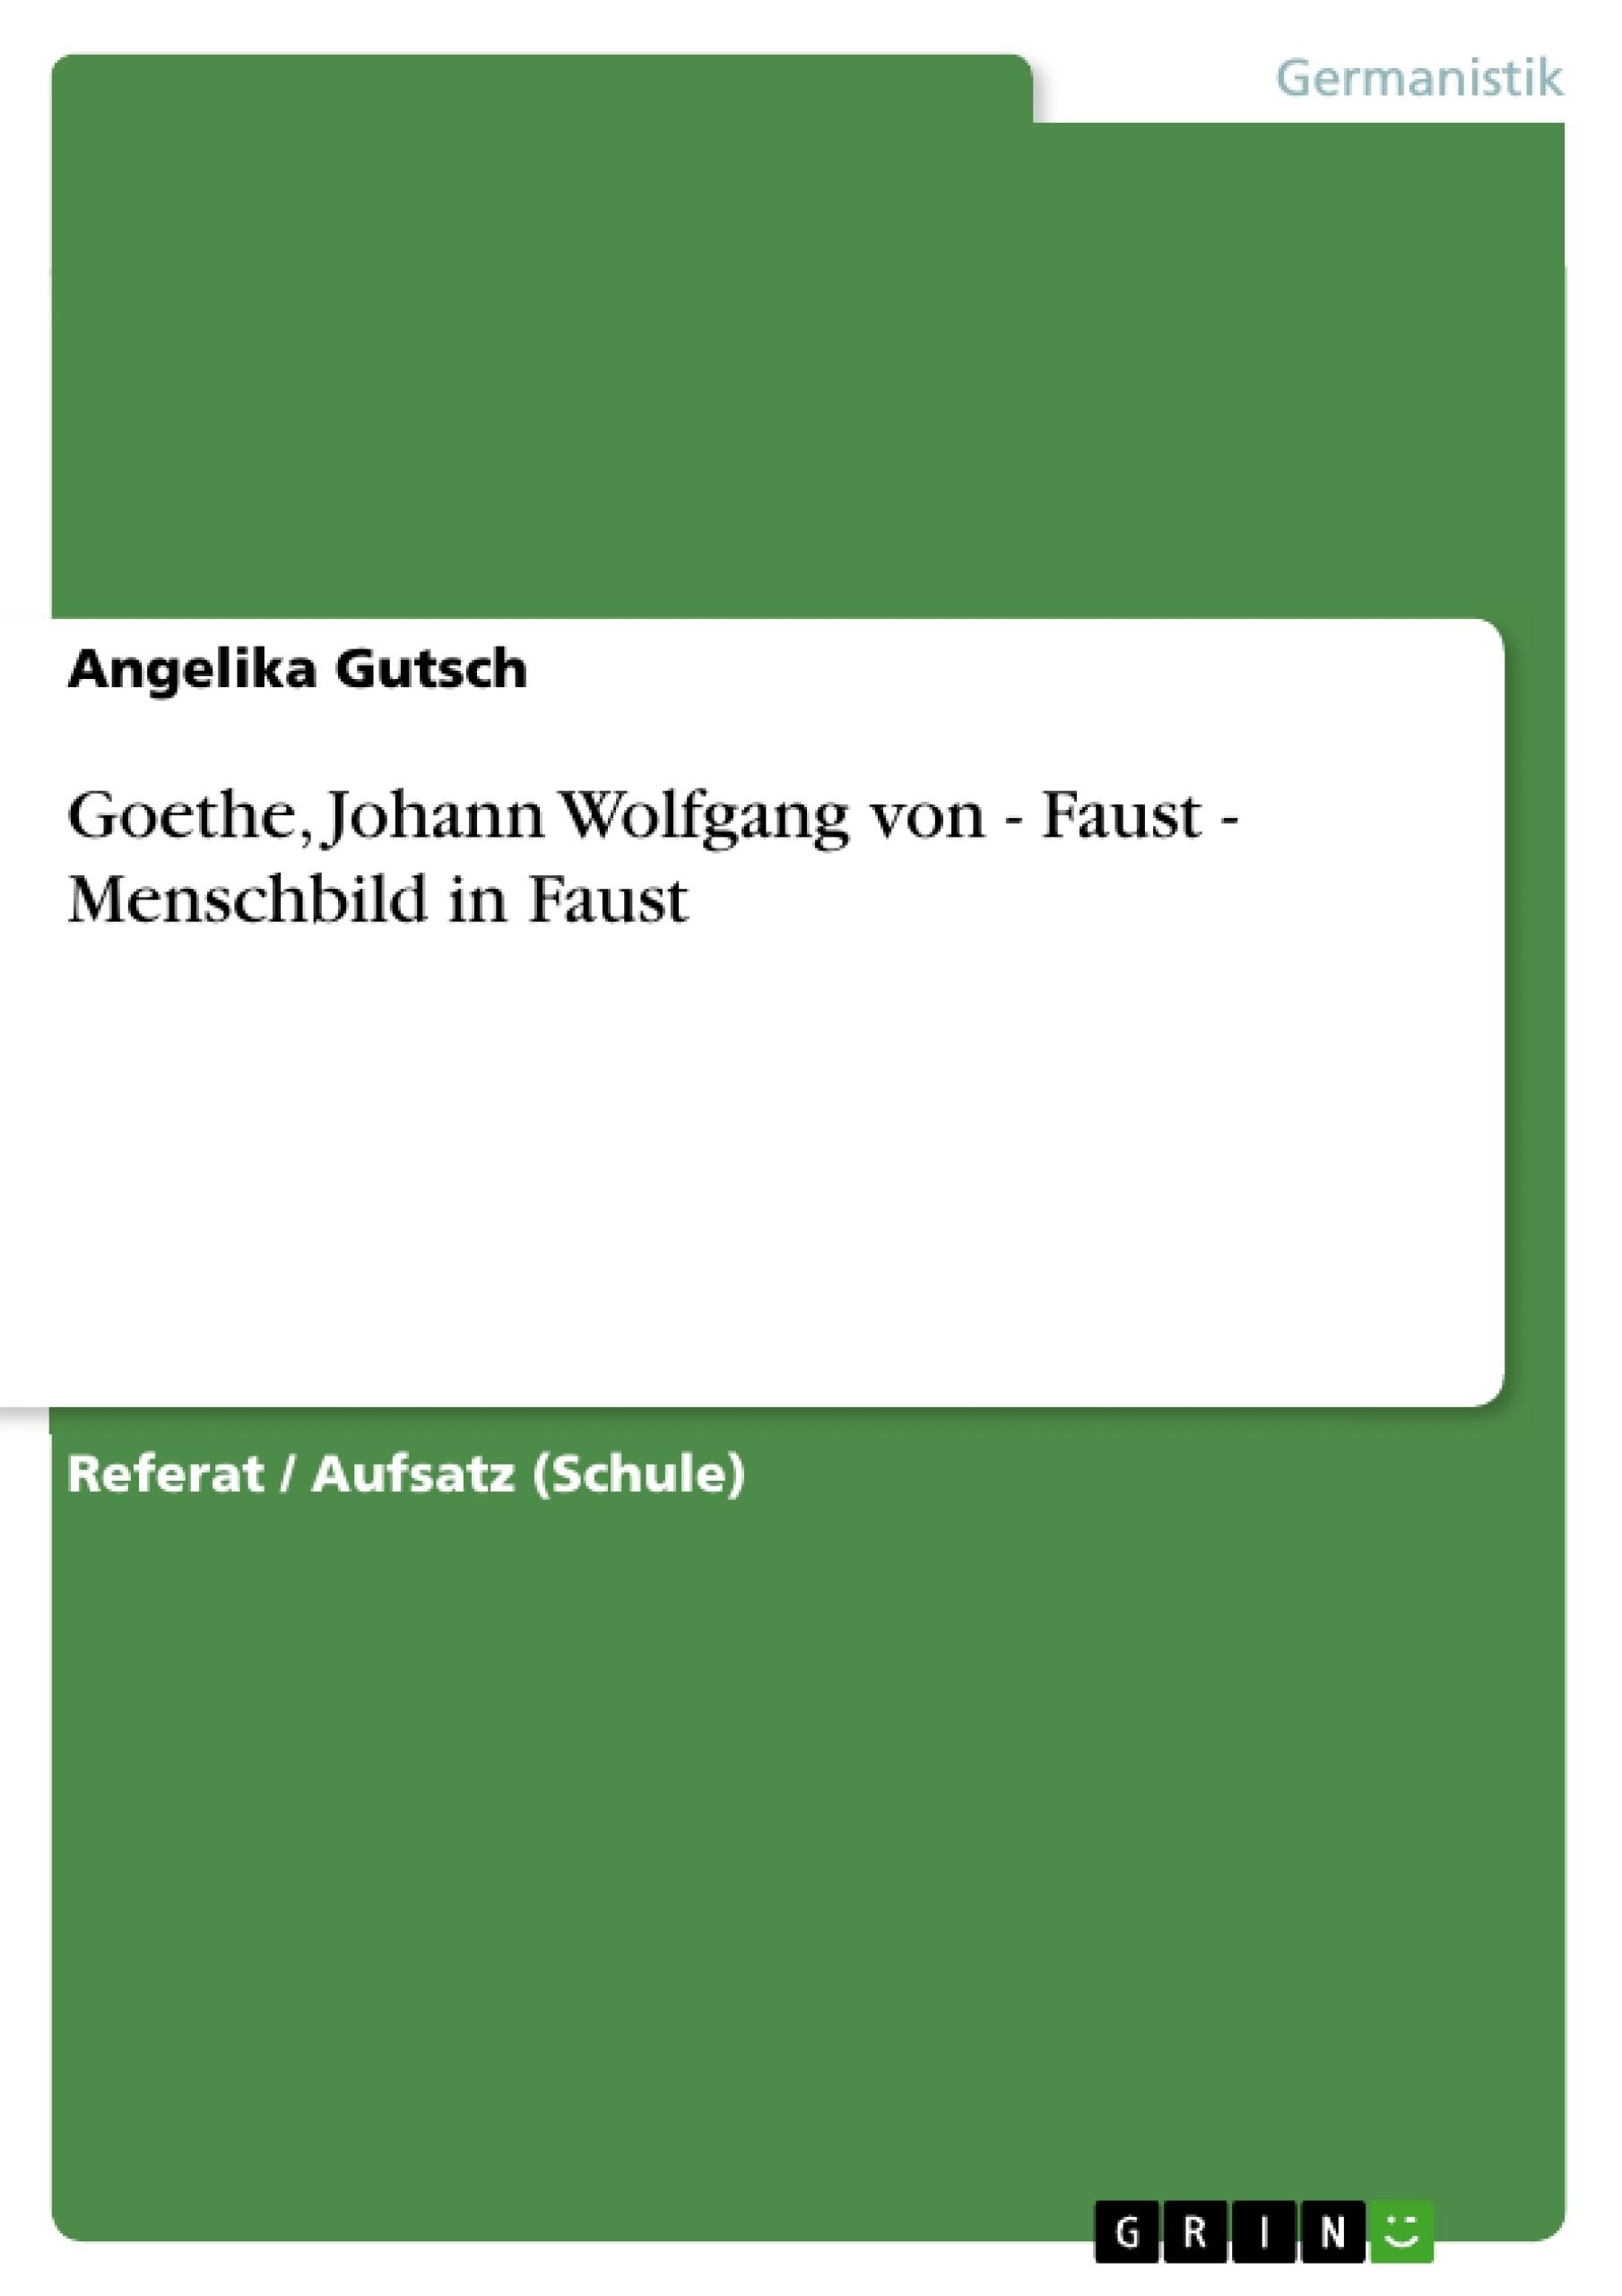 Titel: Goethe, Johann Wolfgang von - Faust - Menschbild in Faust